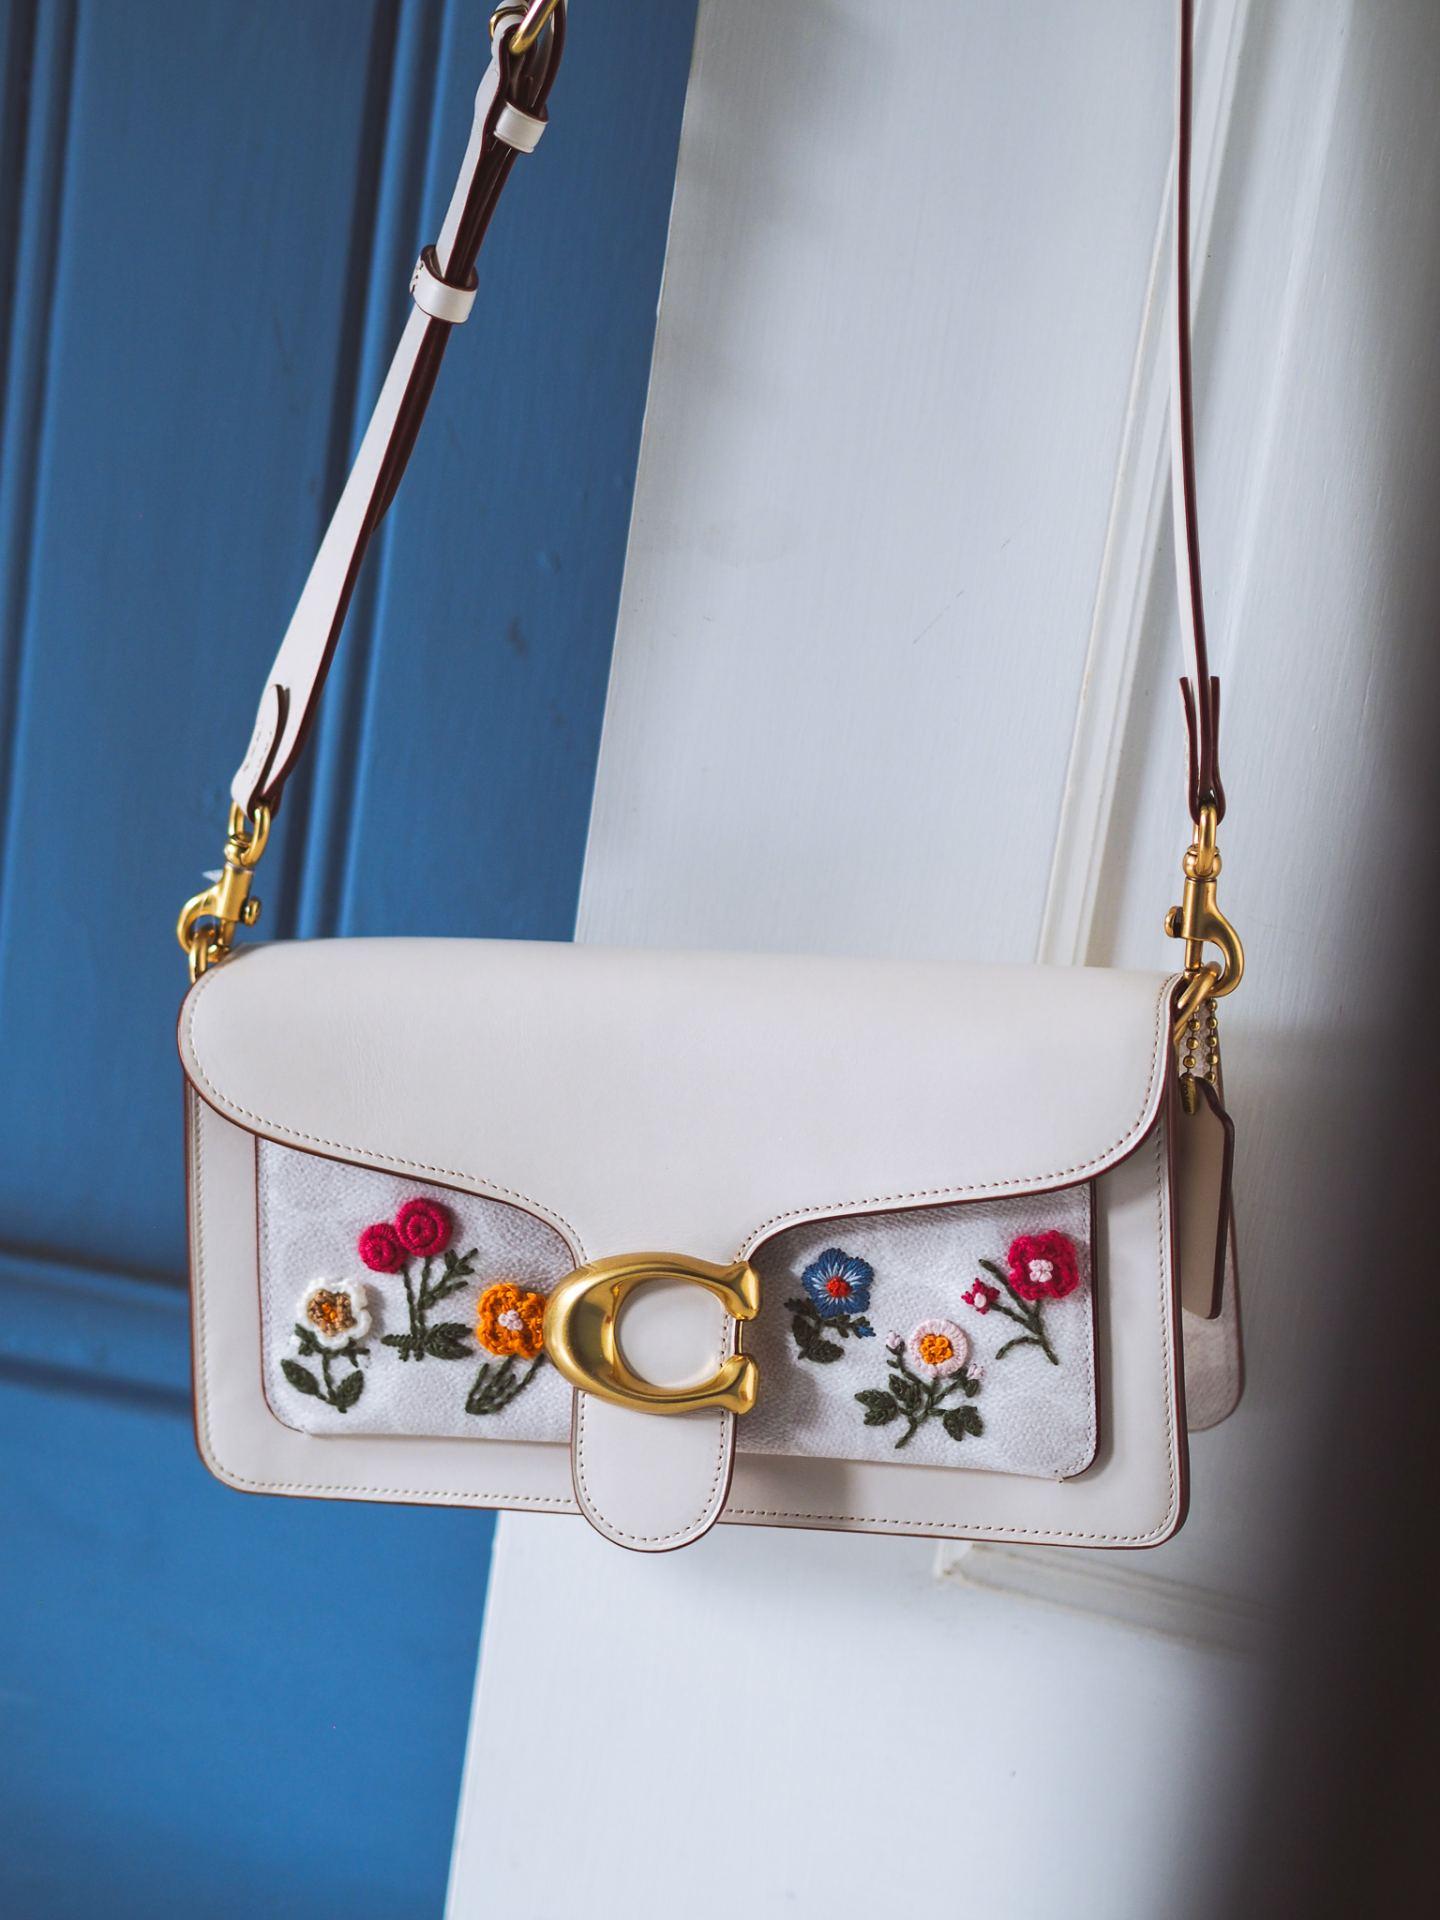 Top 10 Best Coach Handbags coach tabby bag